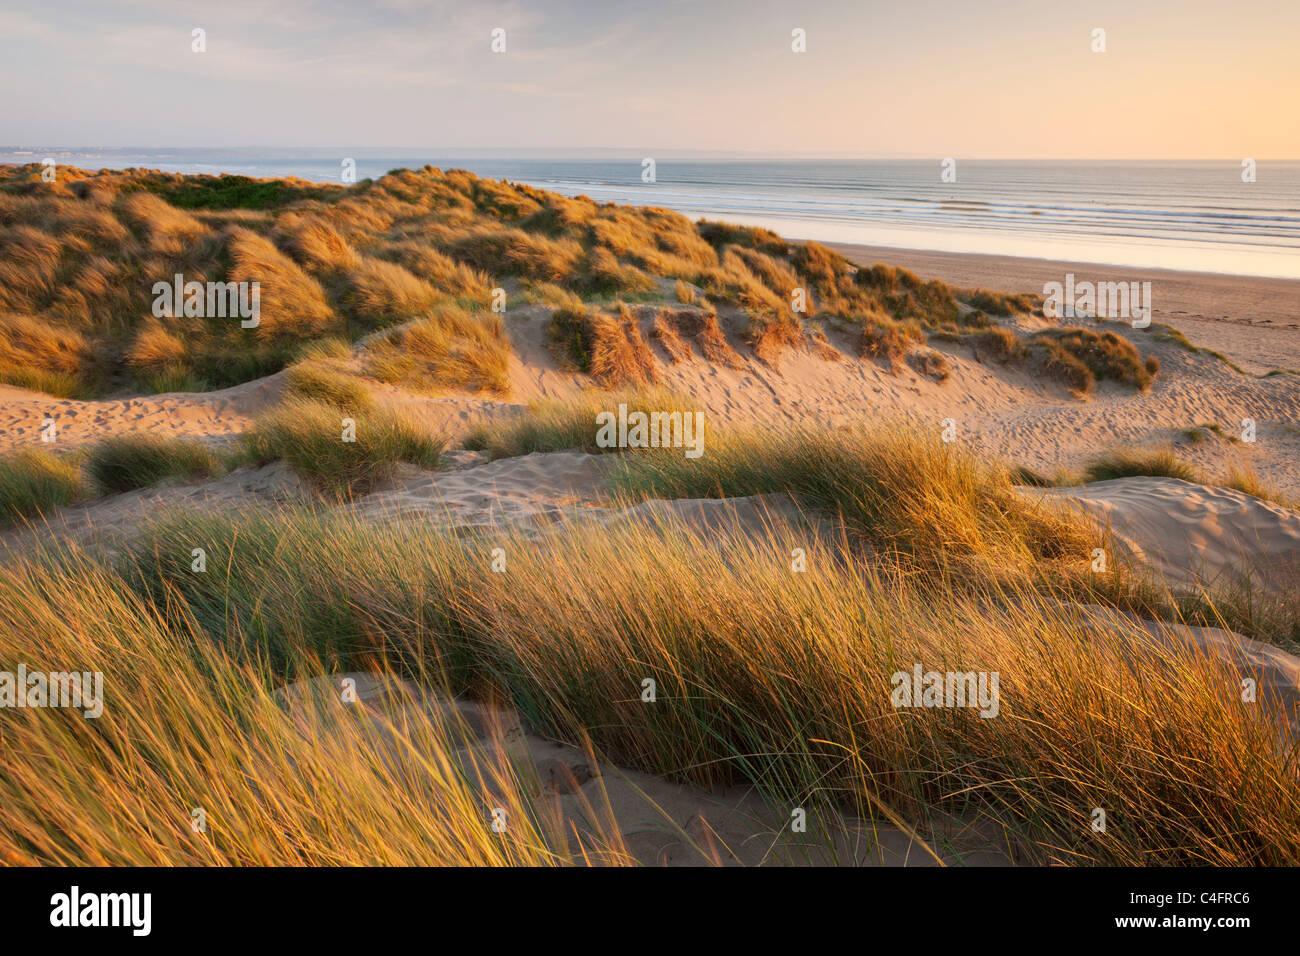 Marram grass on the sand dunes of Braunton Burrows, looking towards Saunton Sands, Devon, England. Summer (June) Stock Photo